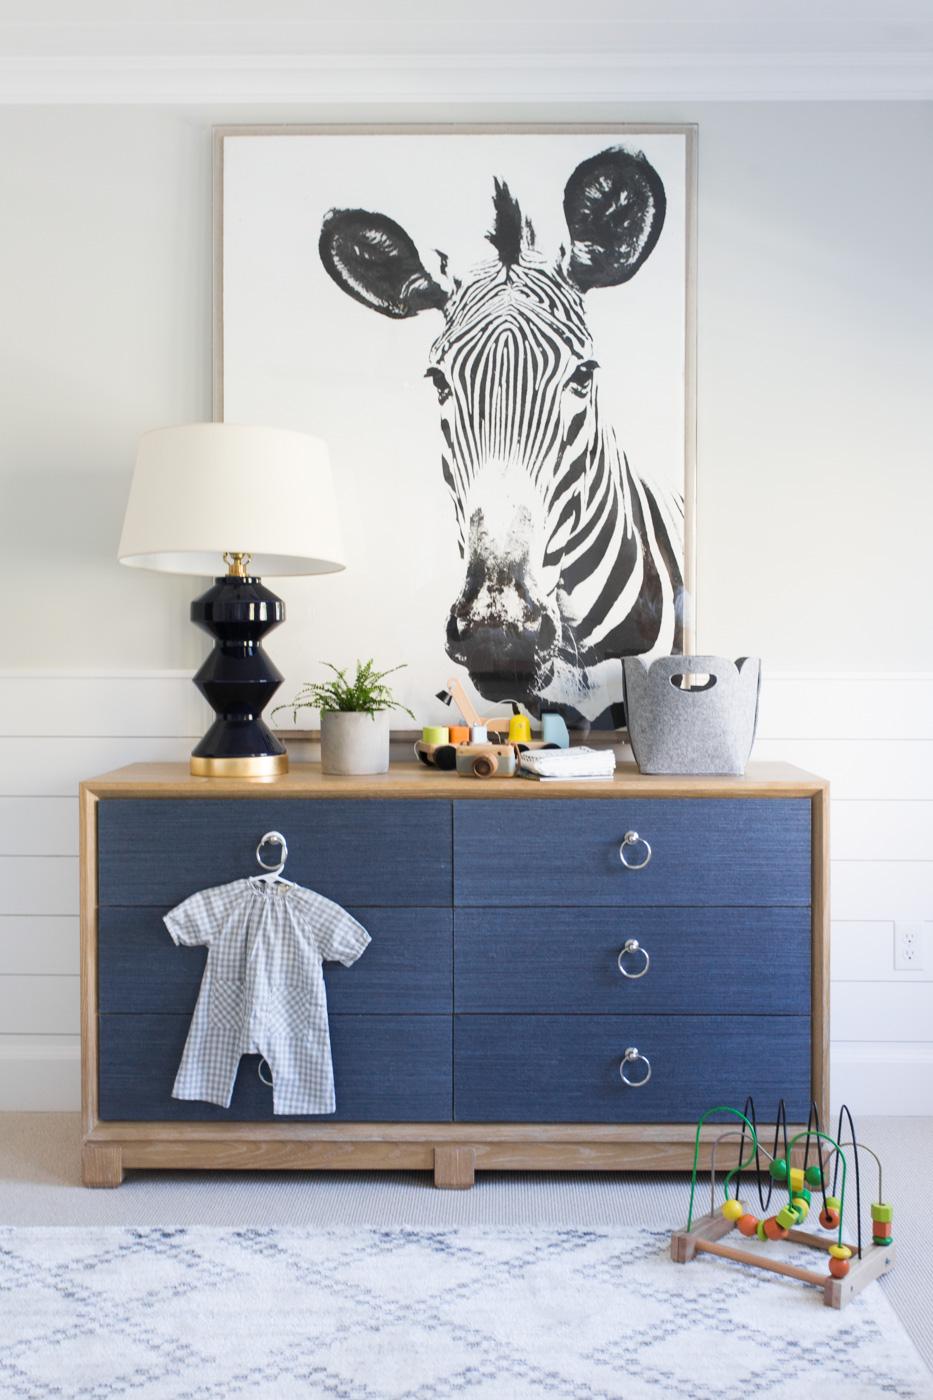 Zebra artwork above blue dresser